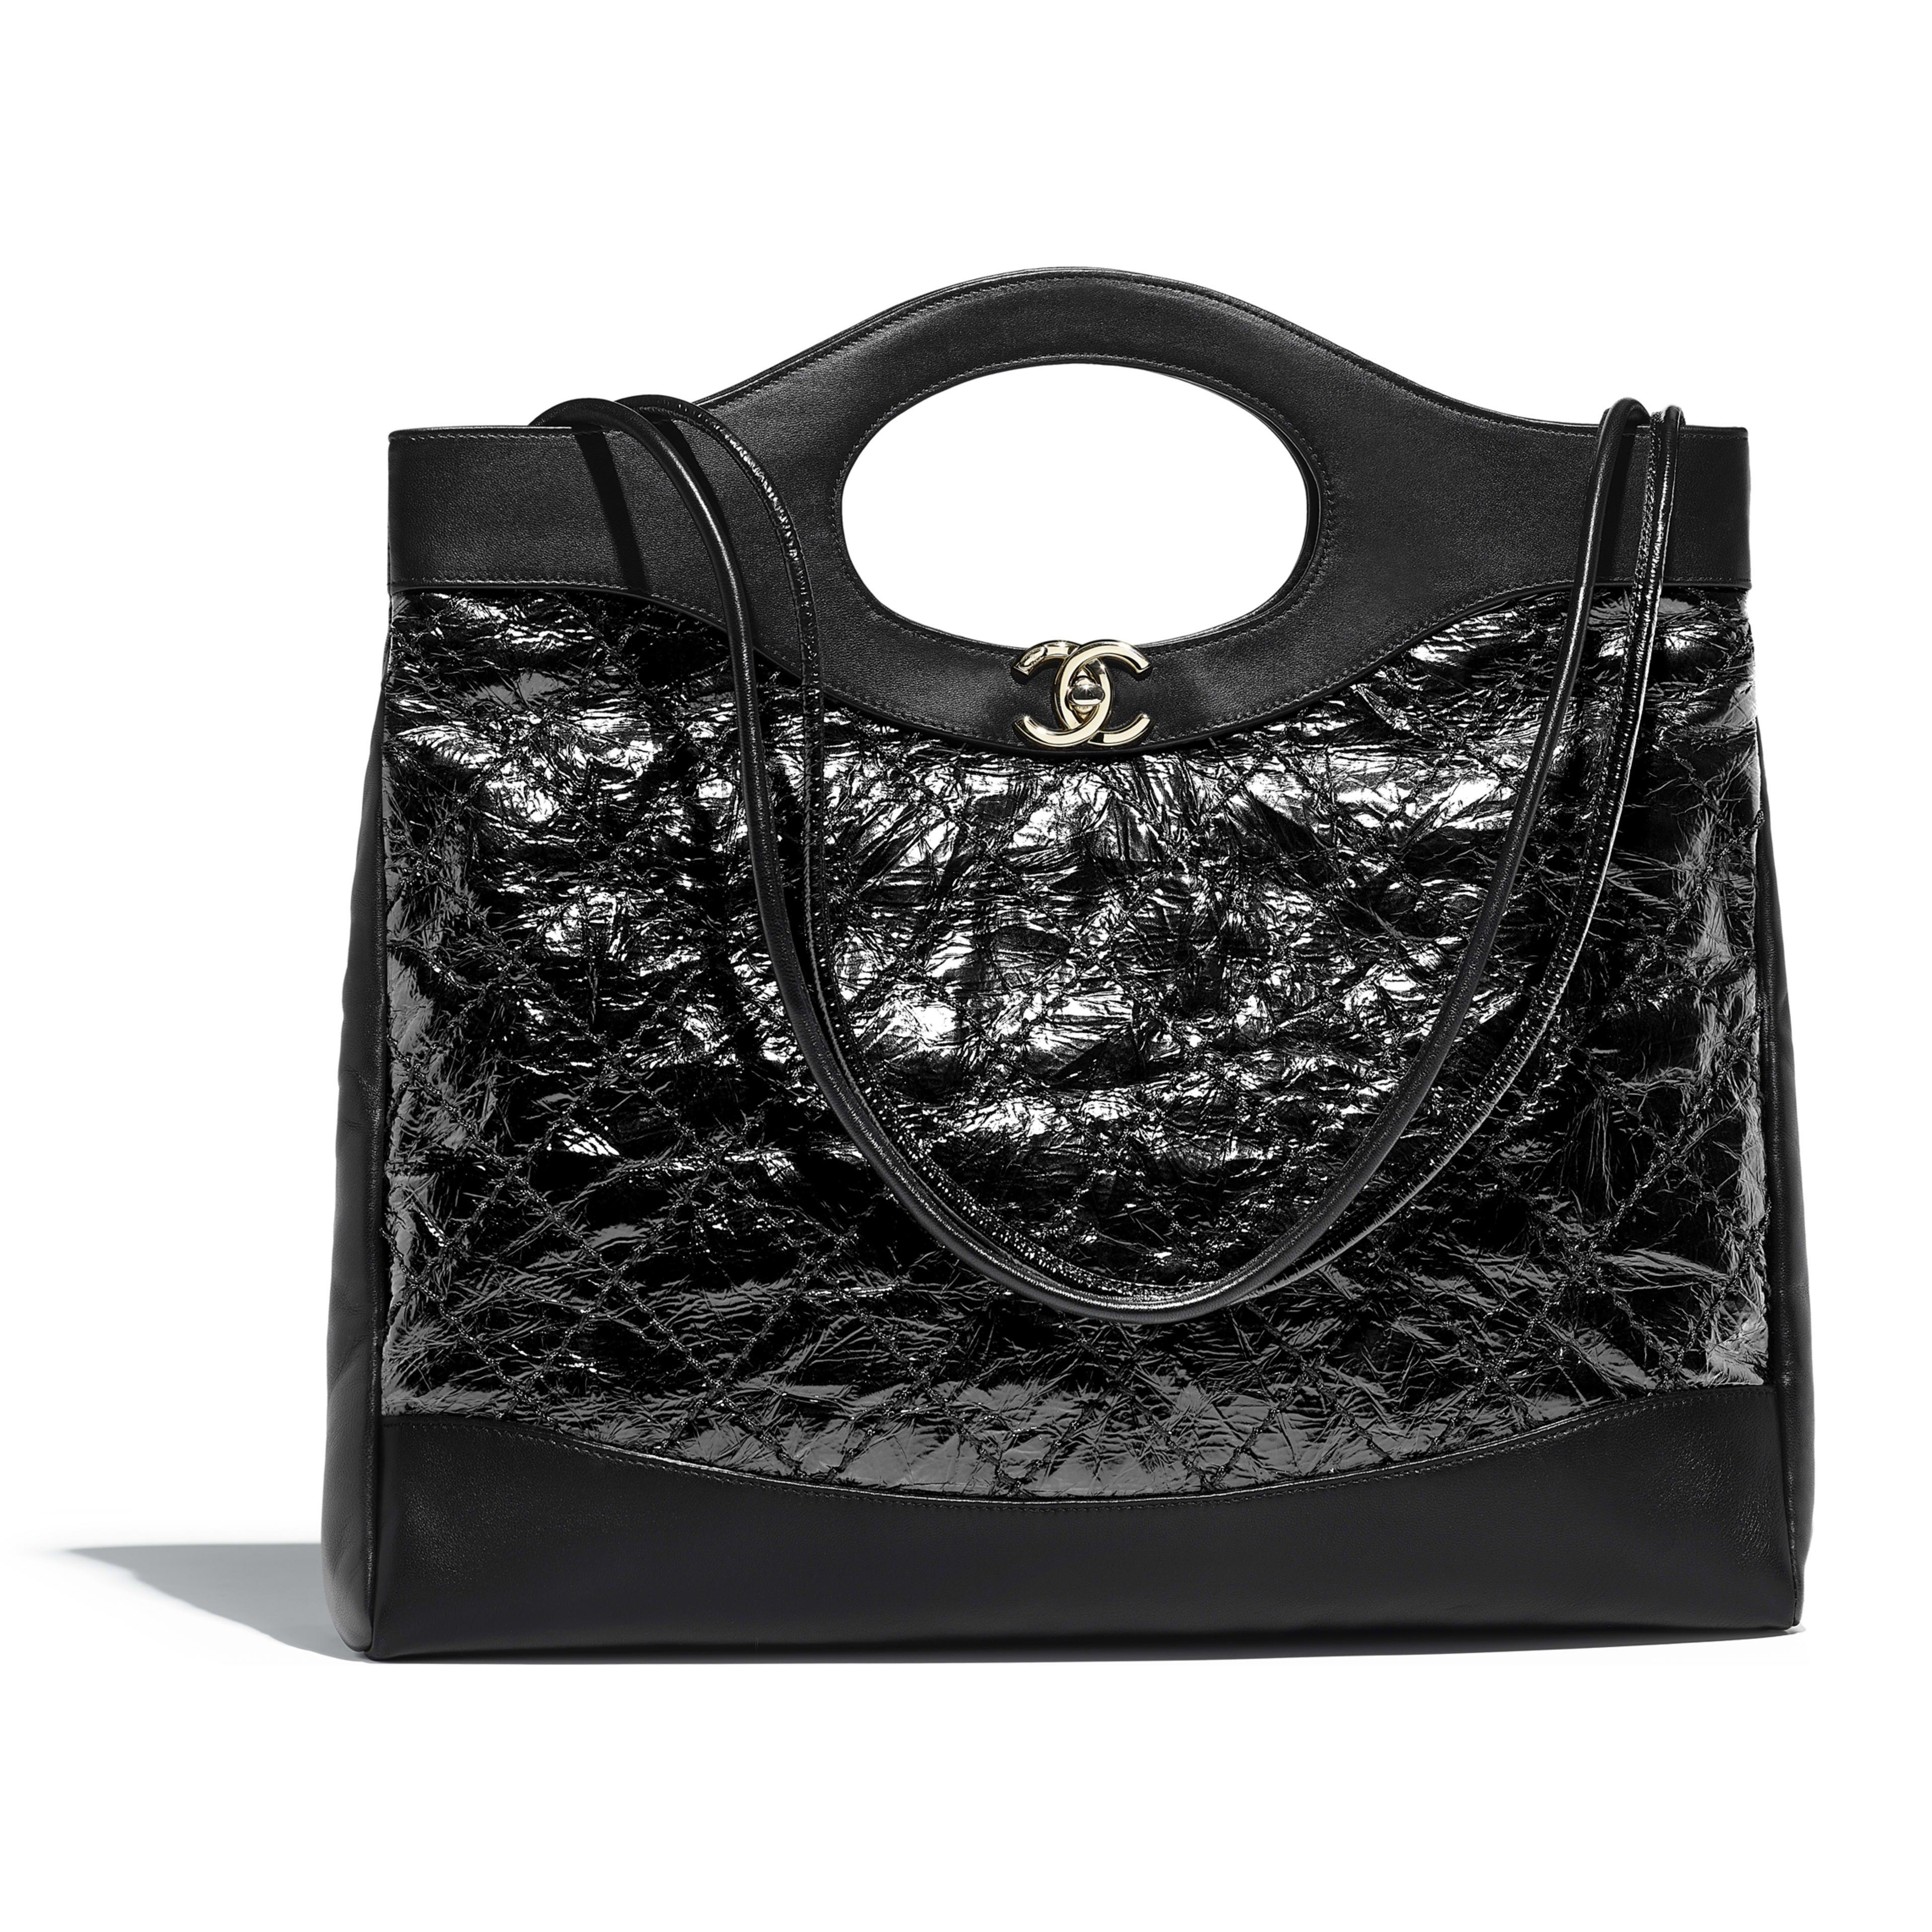 57ccb45e908f CHANEL 31 Large Shopping Bag - Black - Calfskin